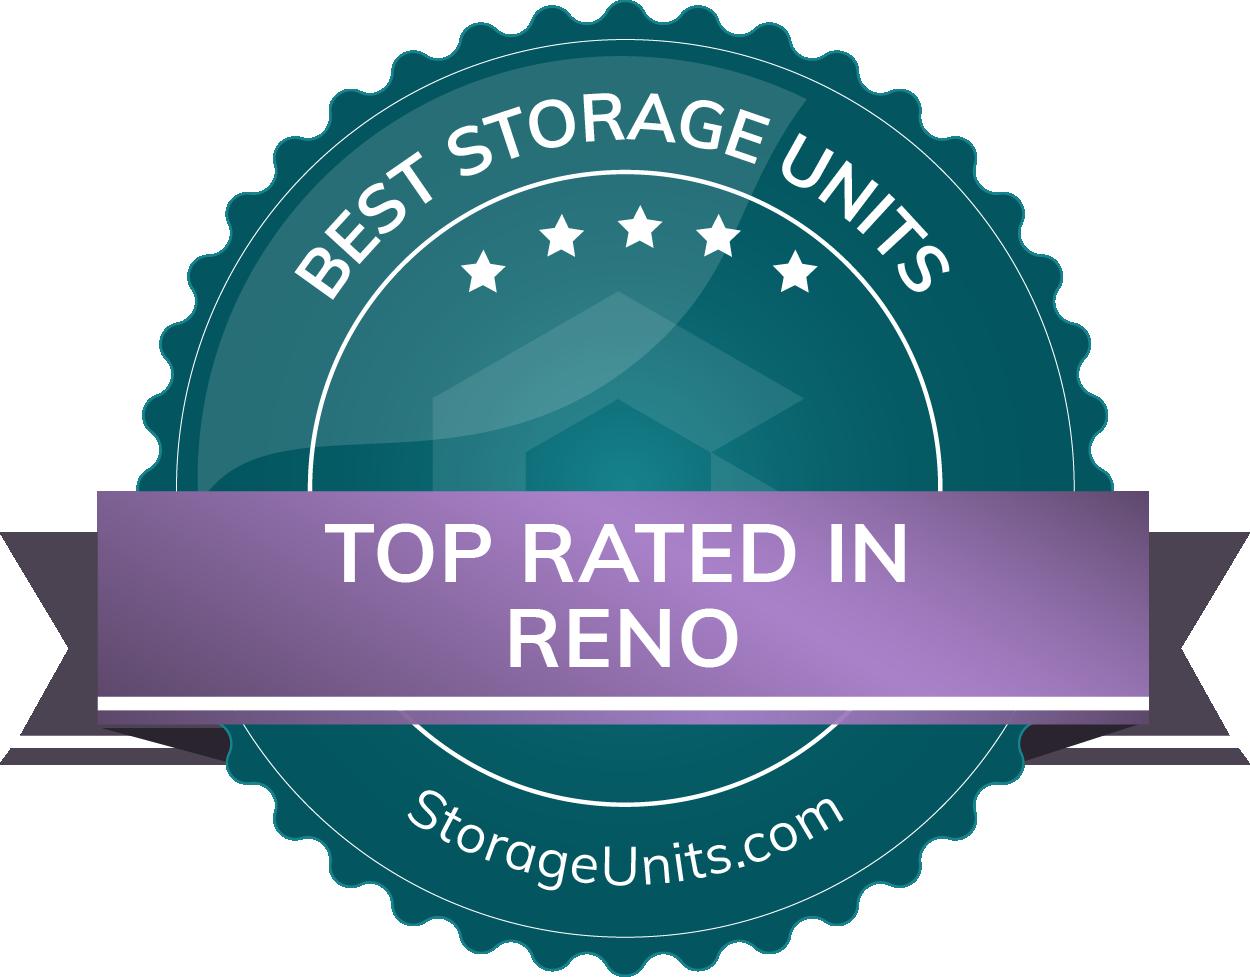 Best Self Storage Units in Reno, NV